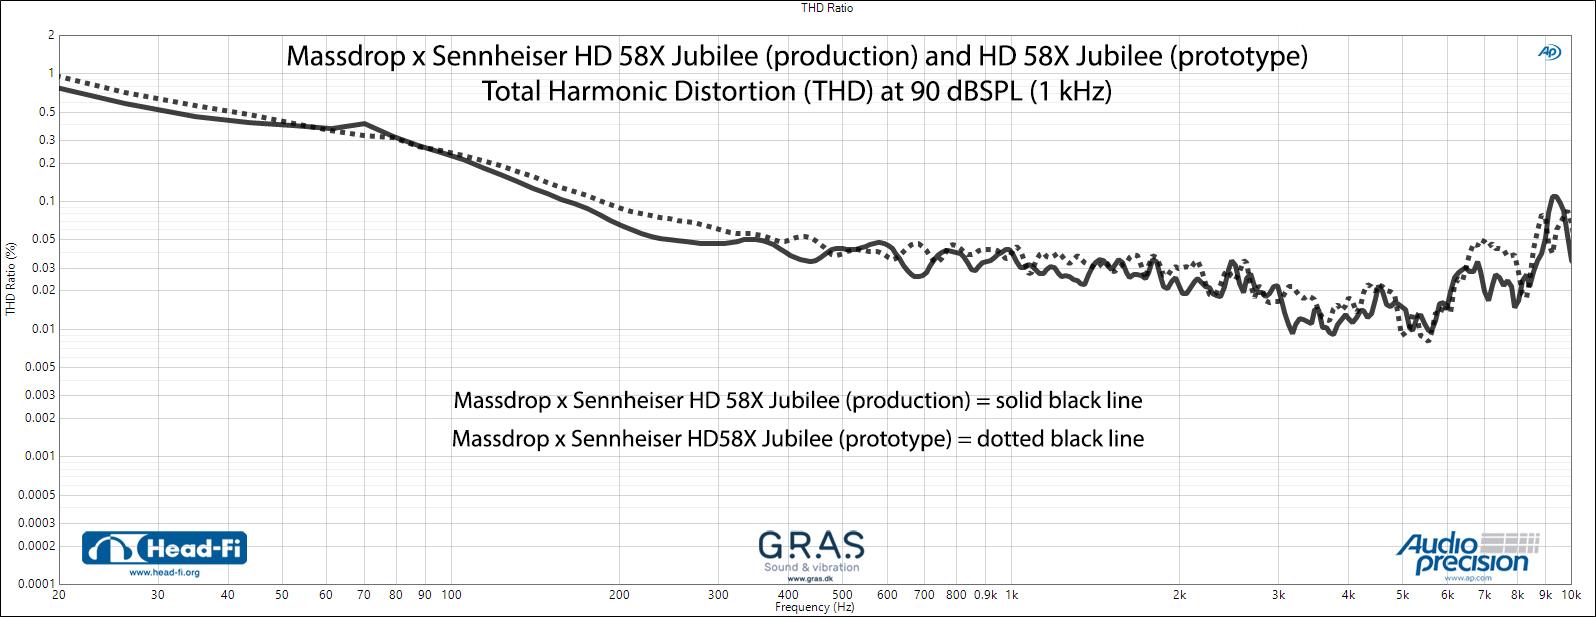 THD_58X-prod_versus_58X-prot.jpg